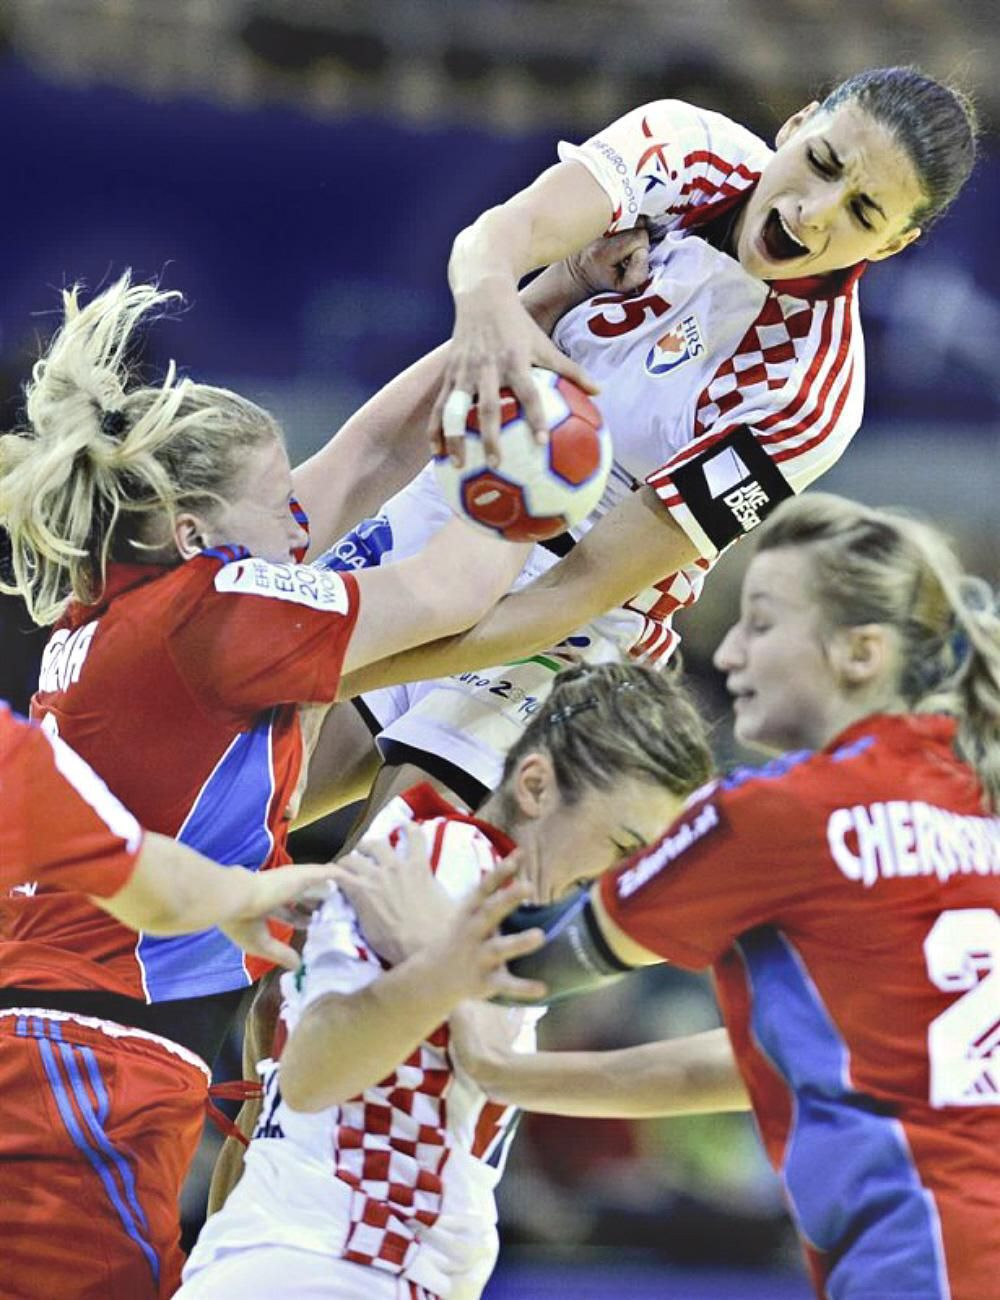 01e Sport 29.12.10. Russia vs Croatia European Womens